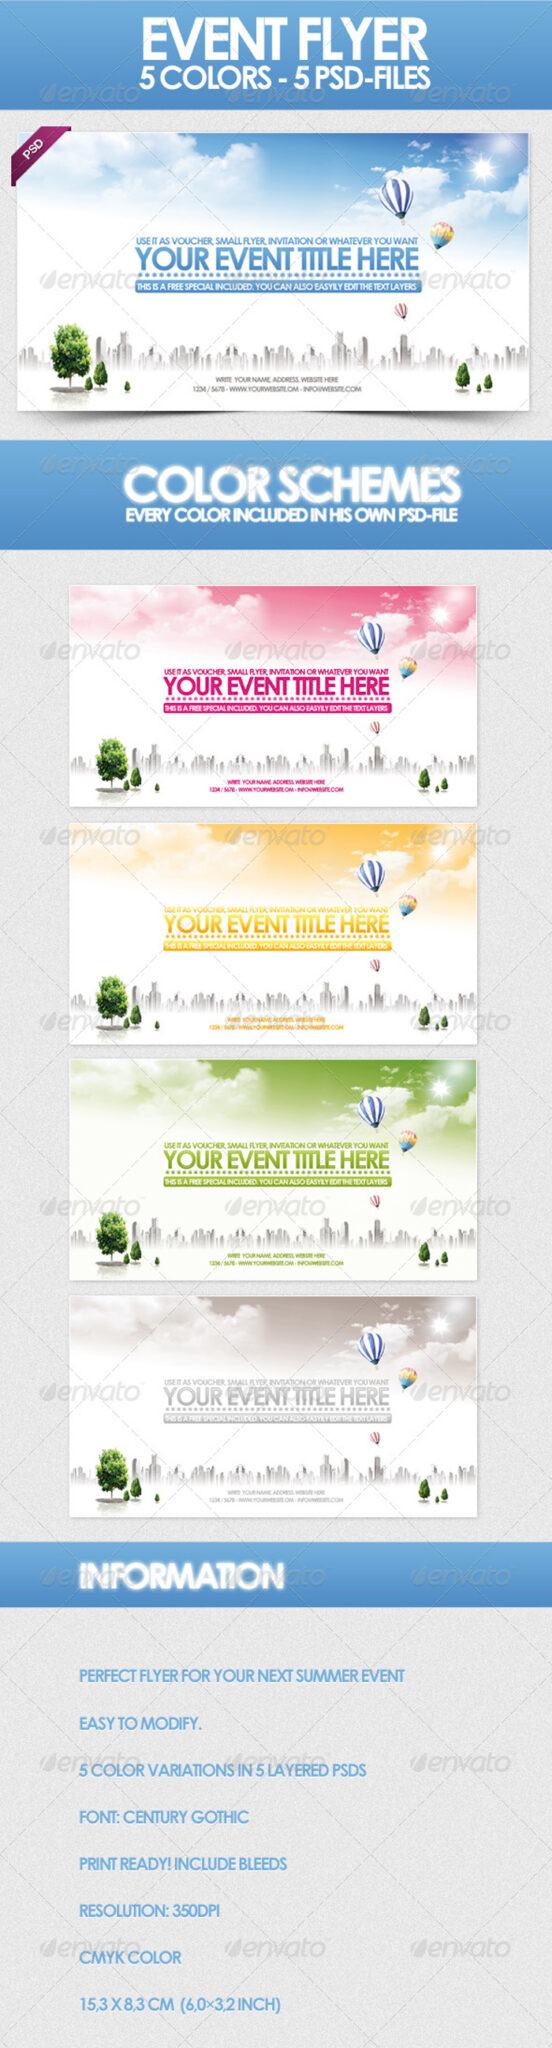 preview-1 43 plantillas de Flyer que debes descargar para tus clientes